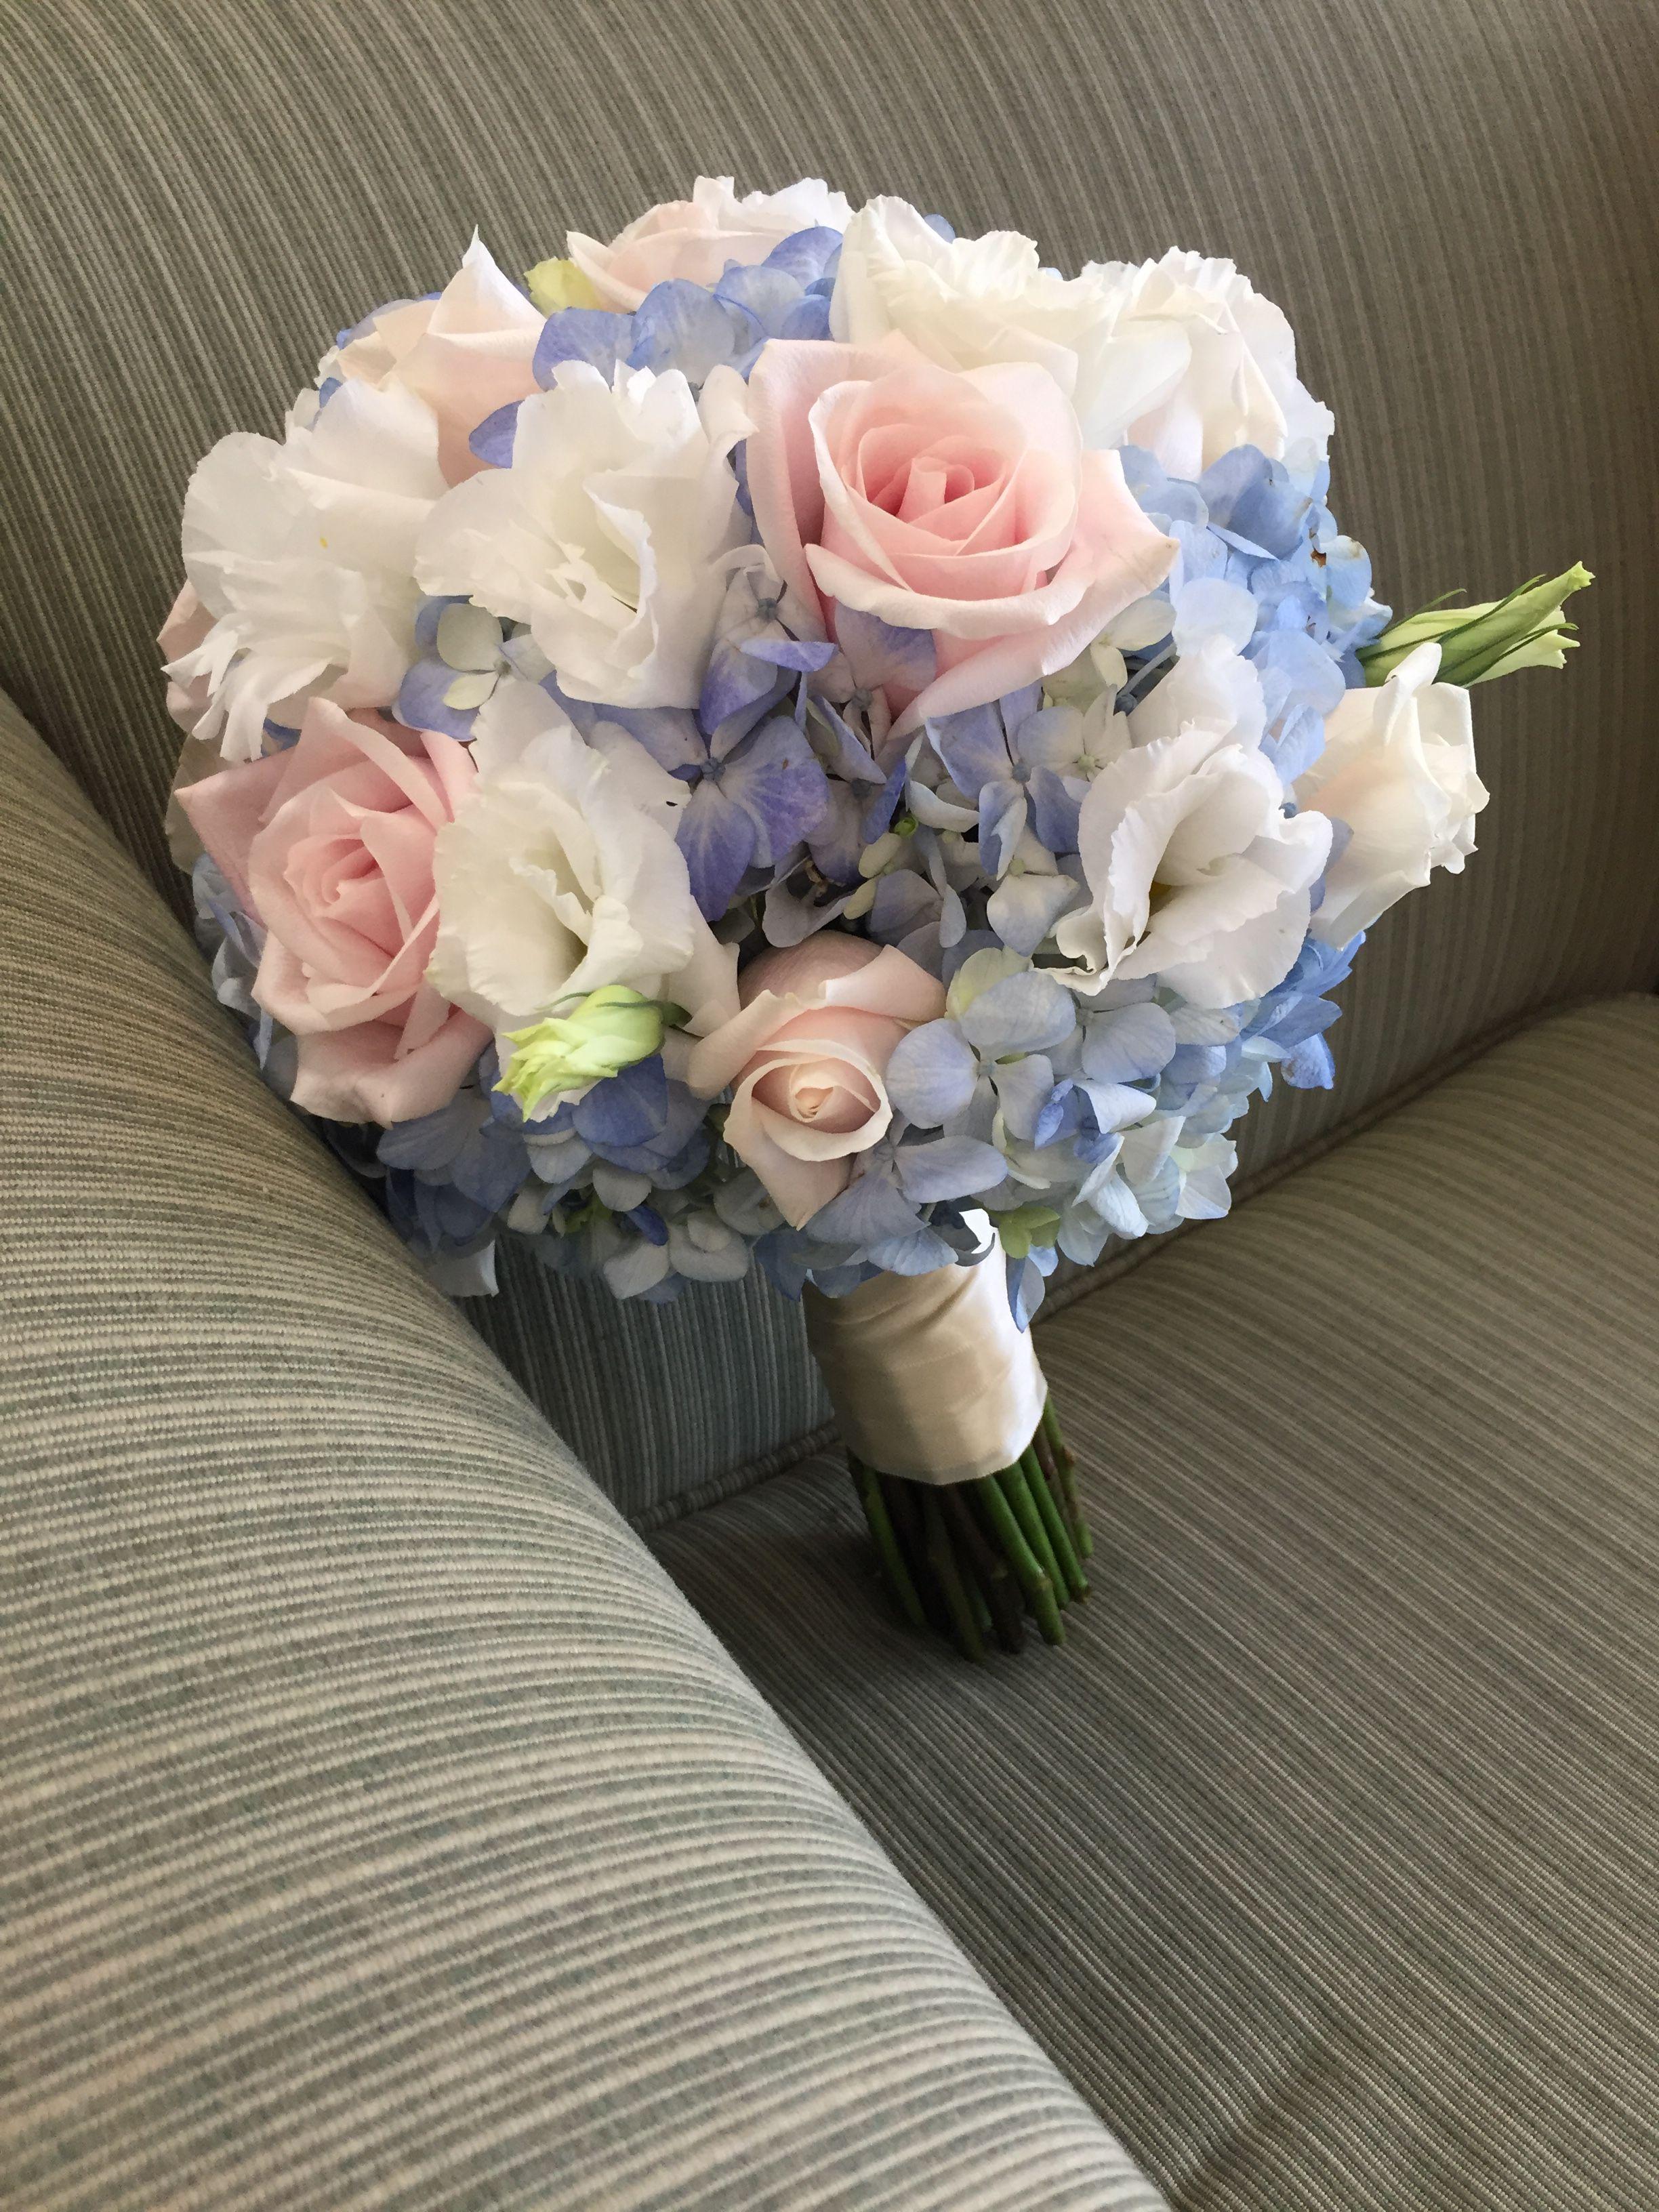 Soft Pink Rose Baby Blue Hydrangea White Lisianthus Wedding Bouquet